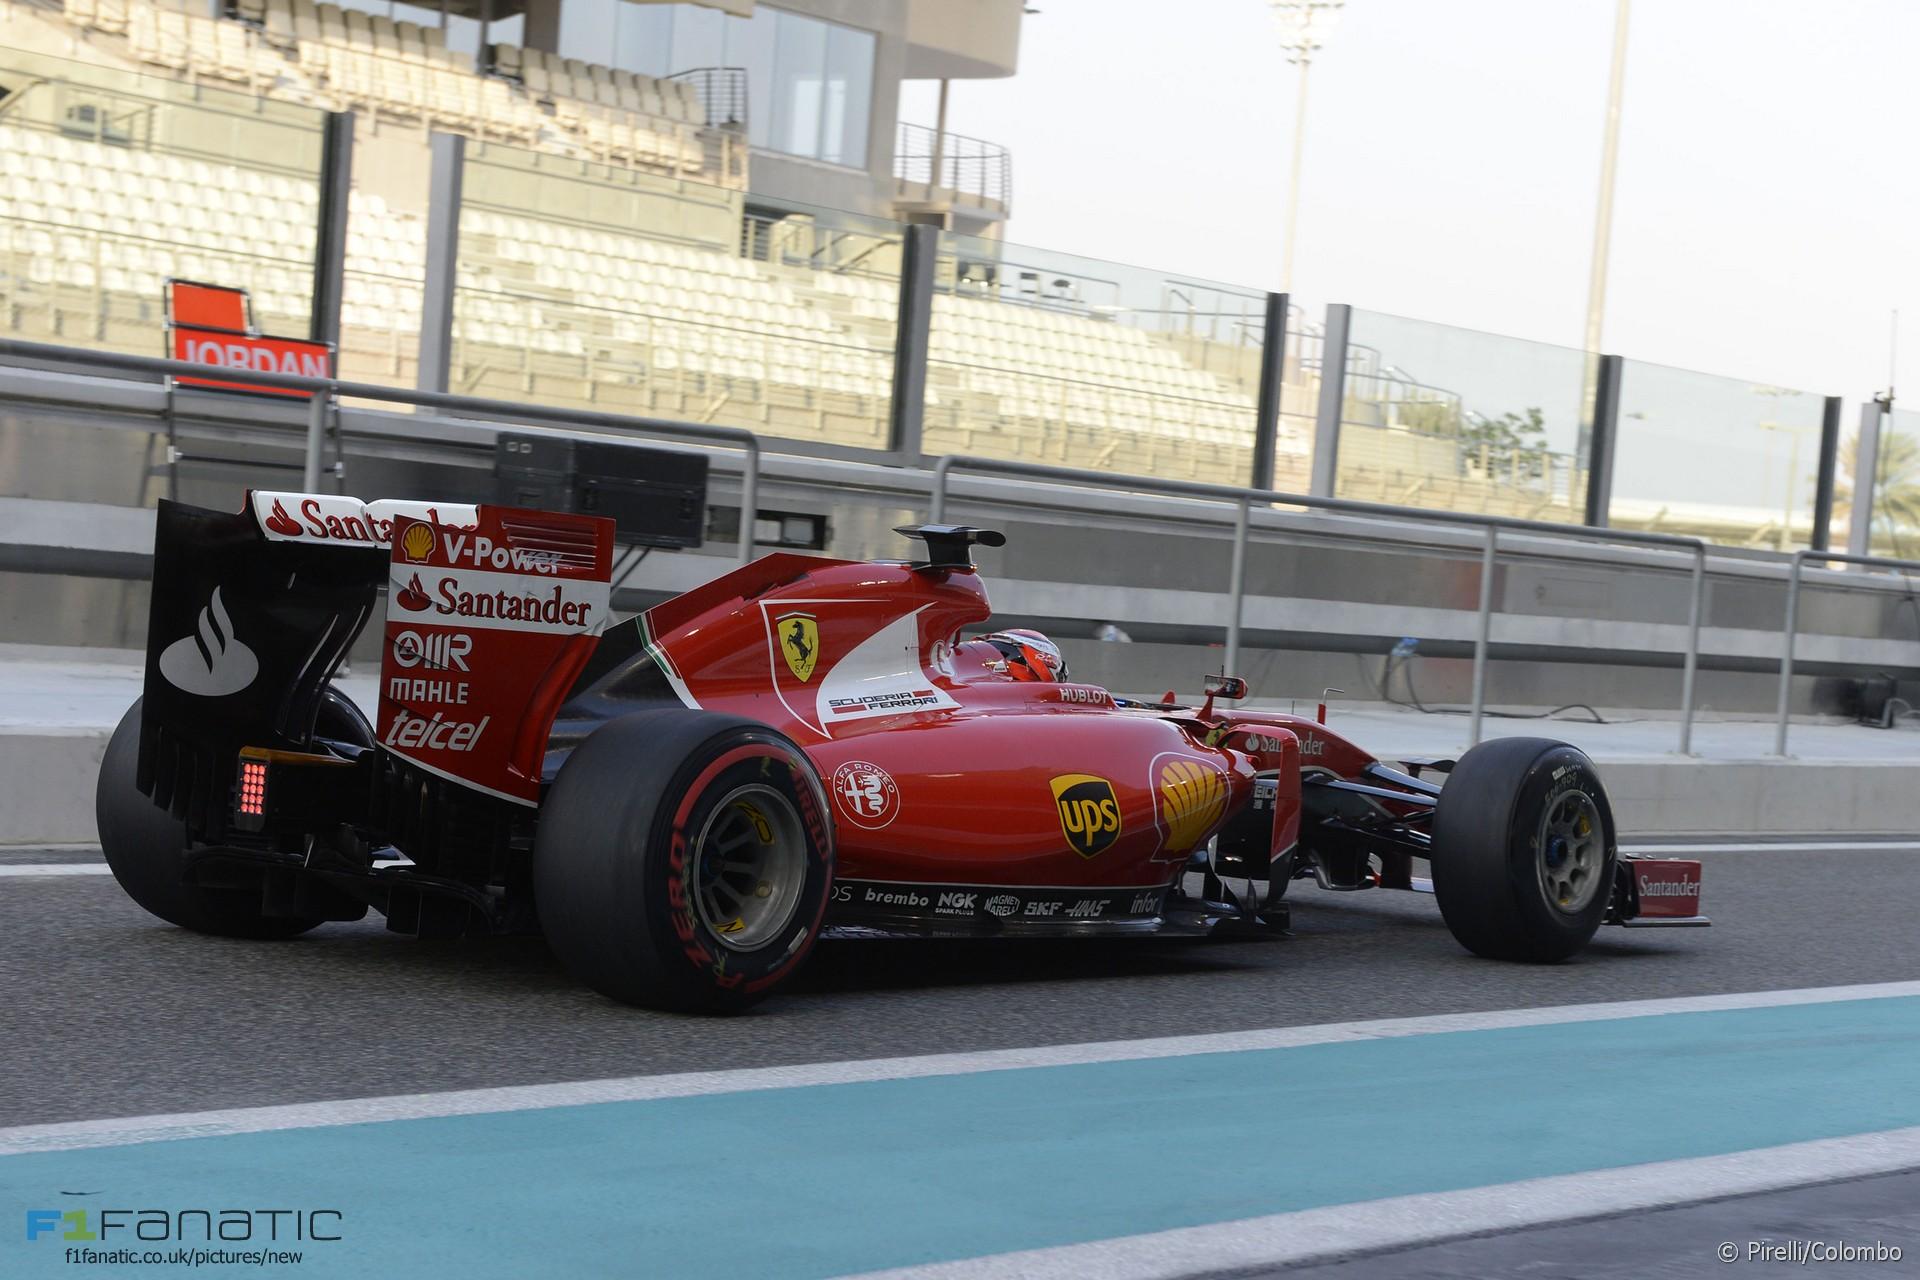 Kimi Raikkonen, Ferrari, Yas Marina, 2015